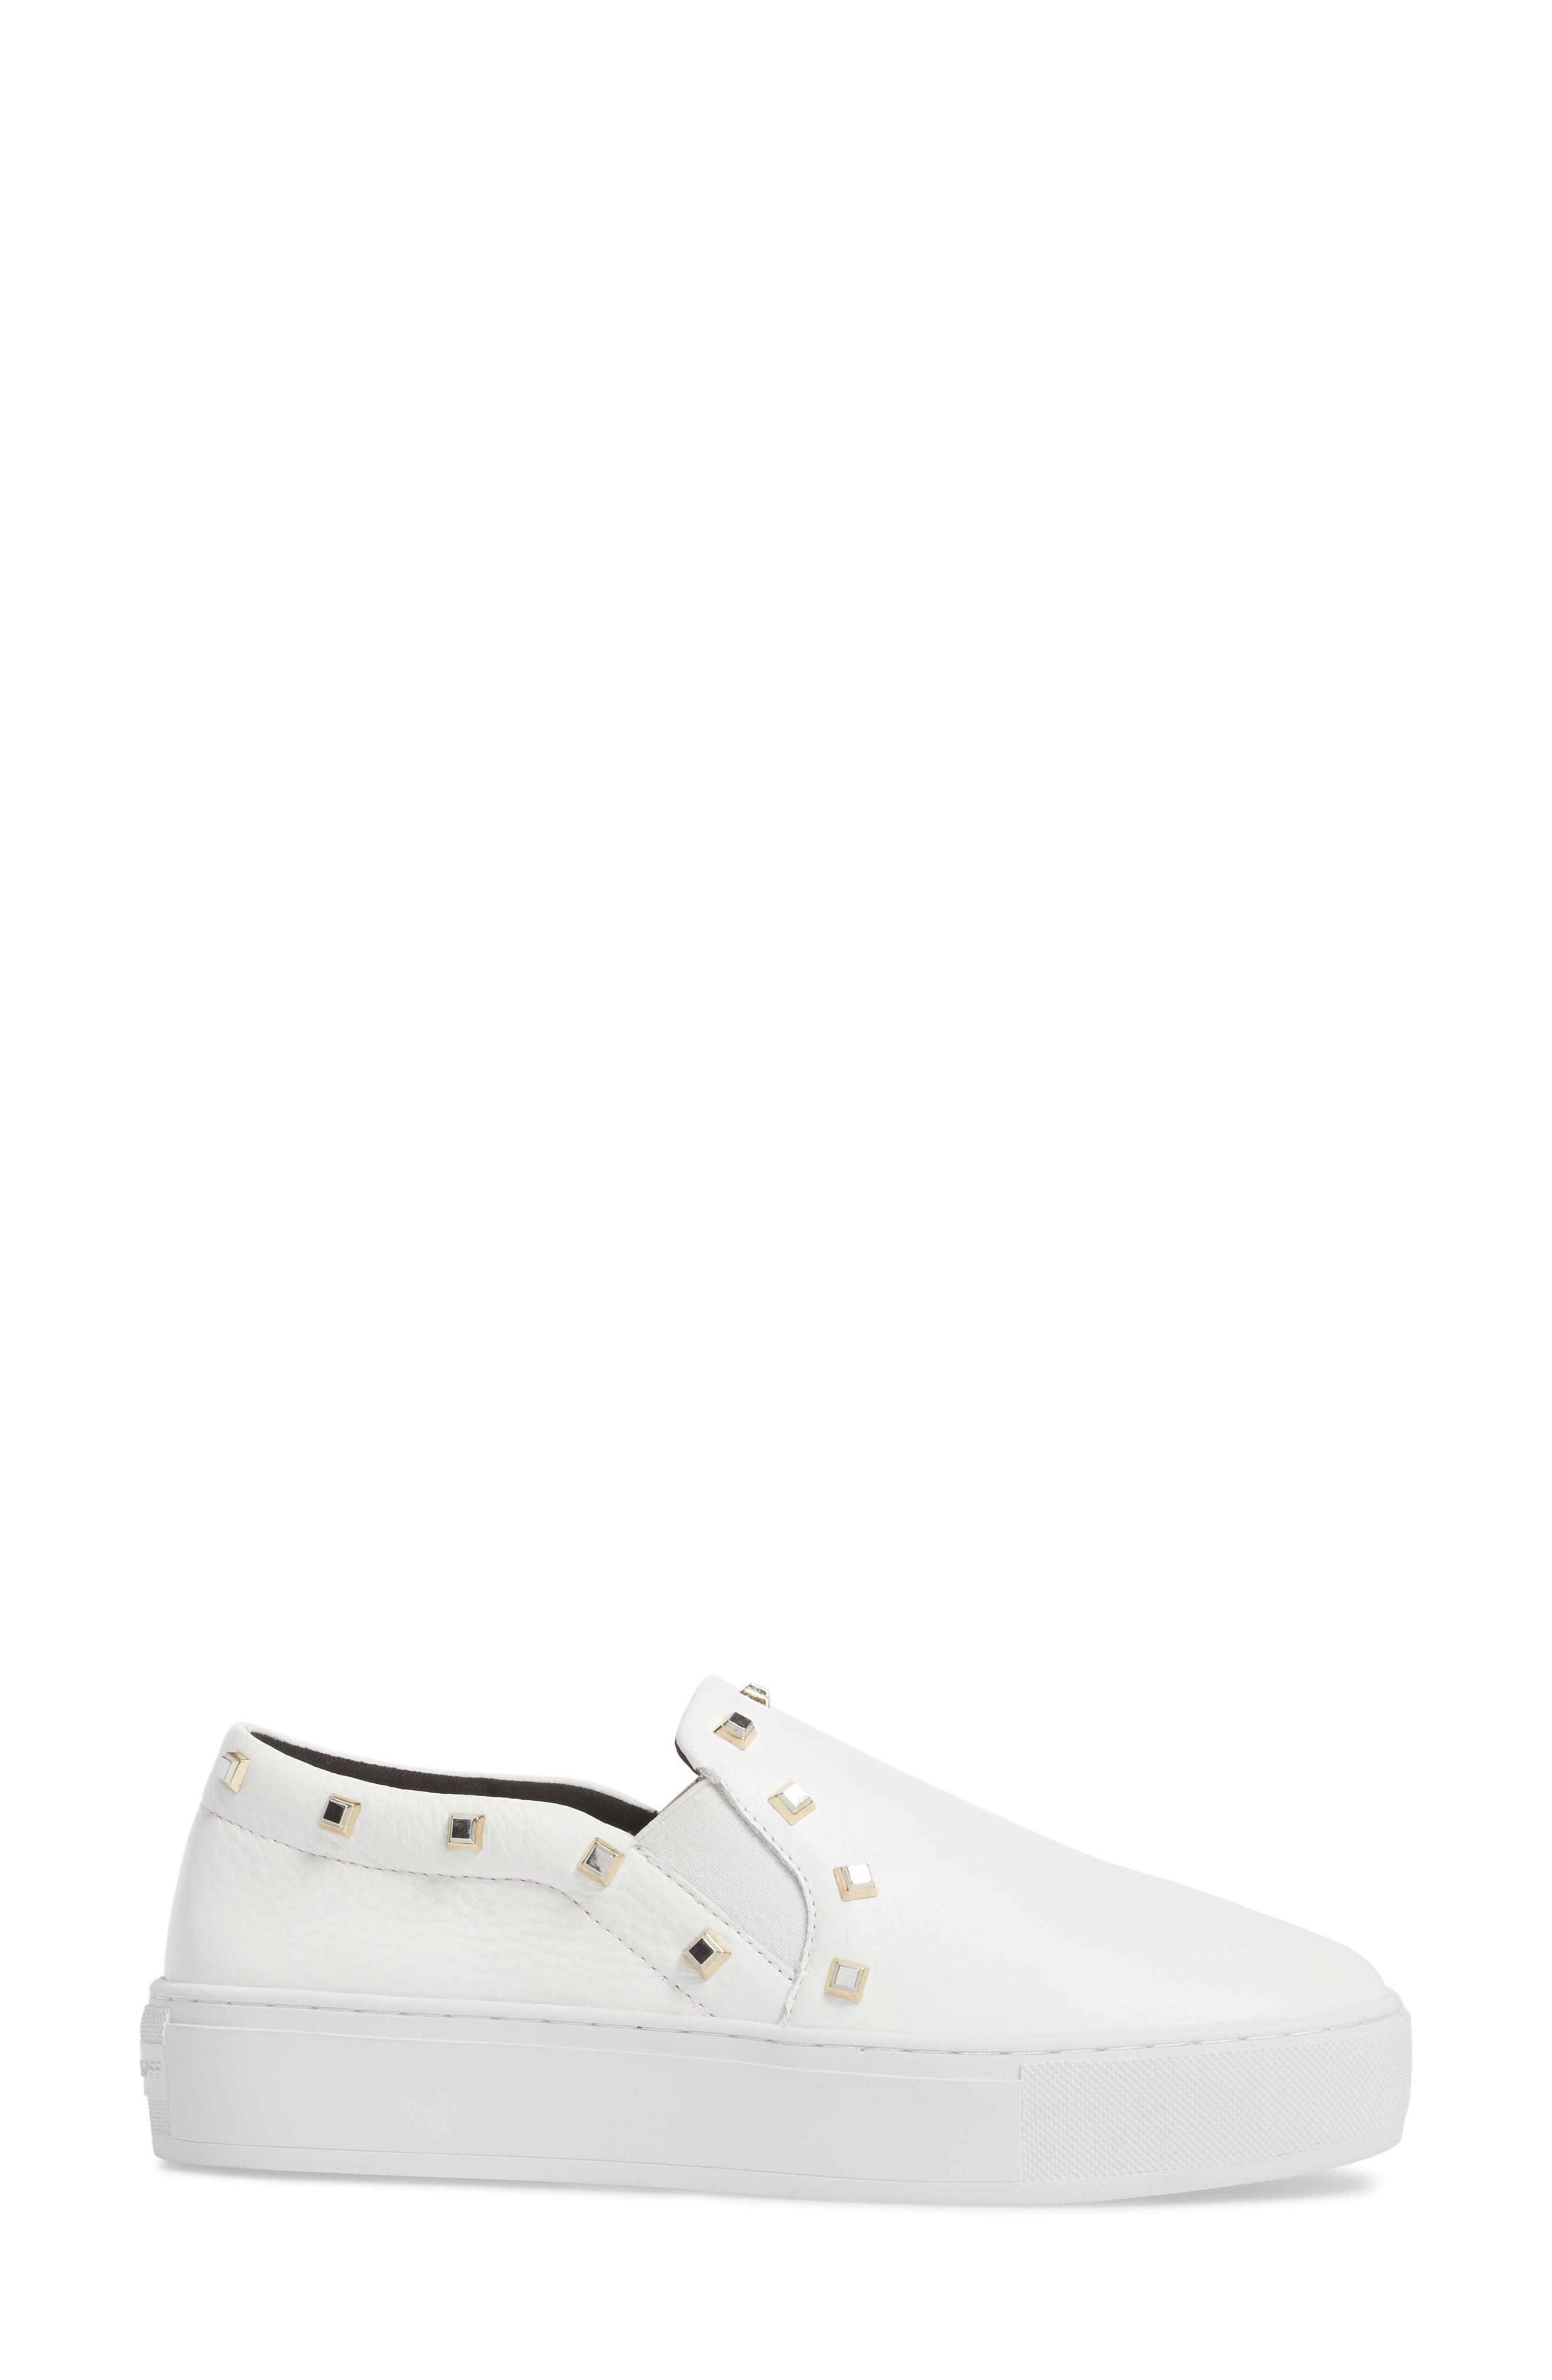 Nora Stud Platform Sneaker,                             Alternate thumbnail 6, color,